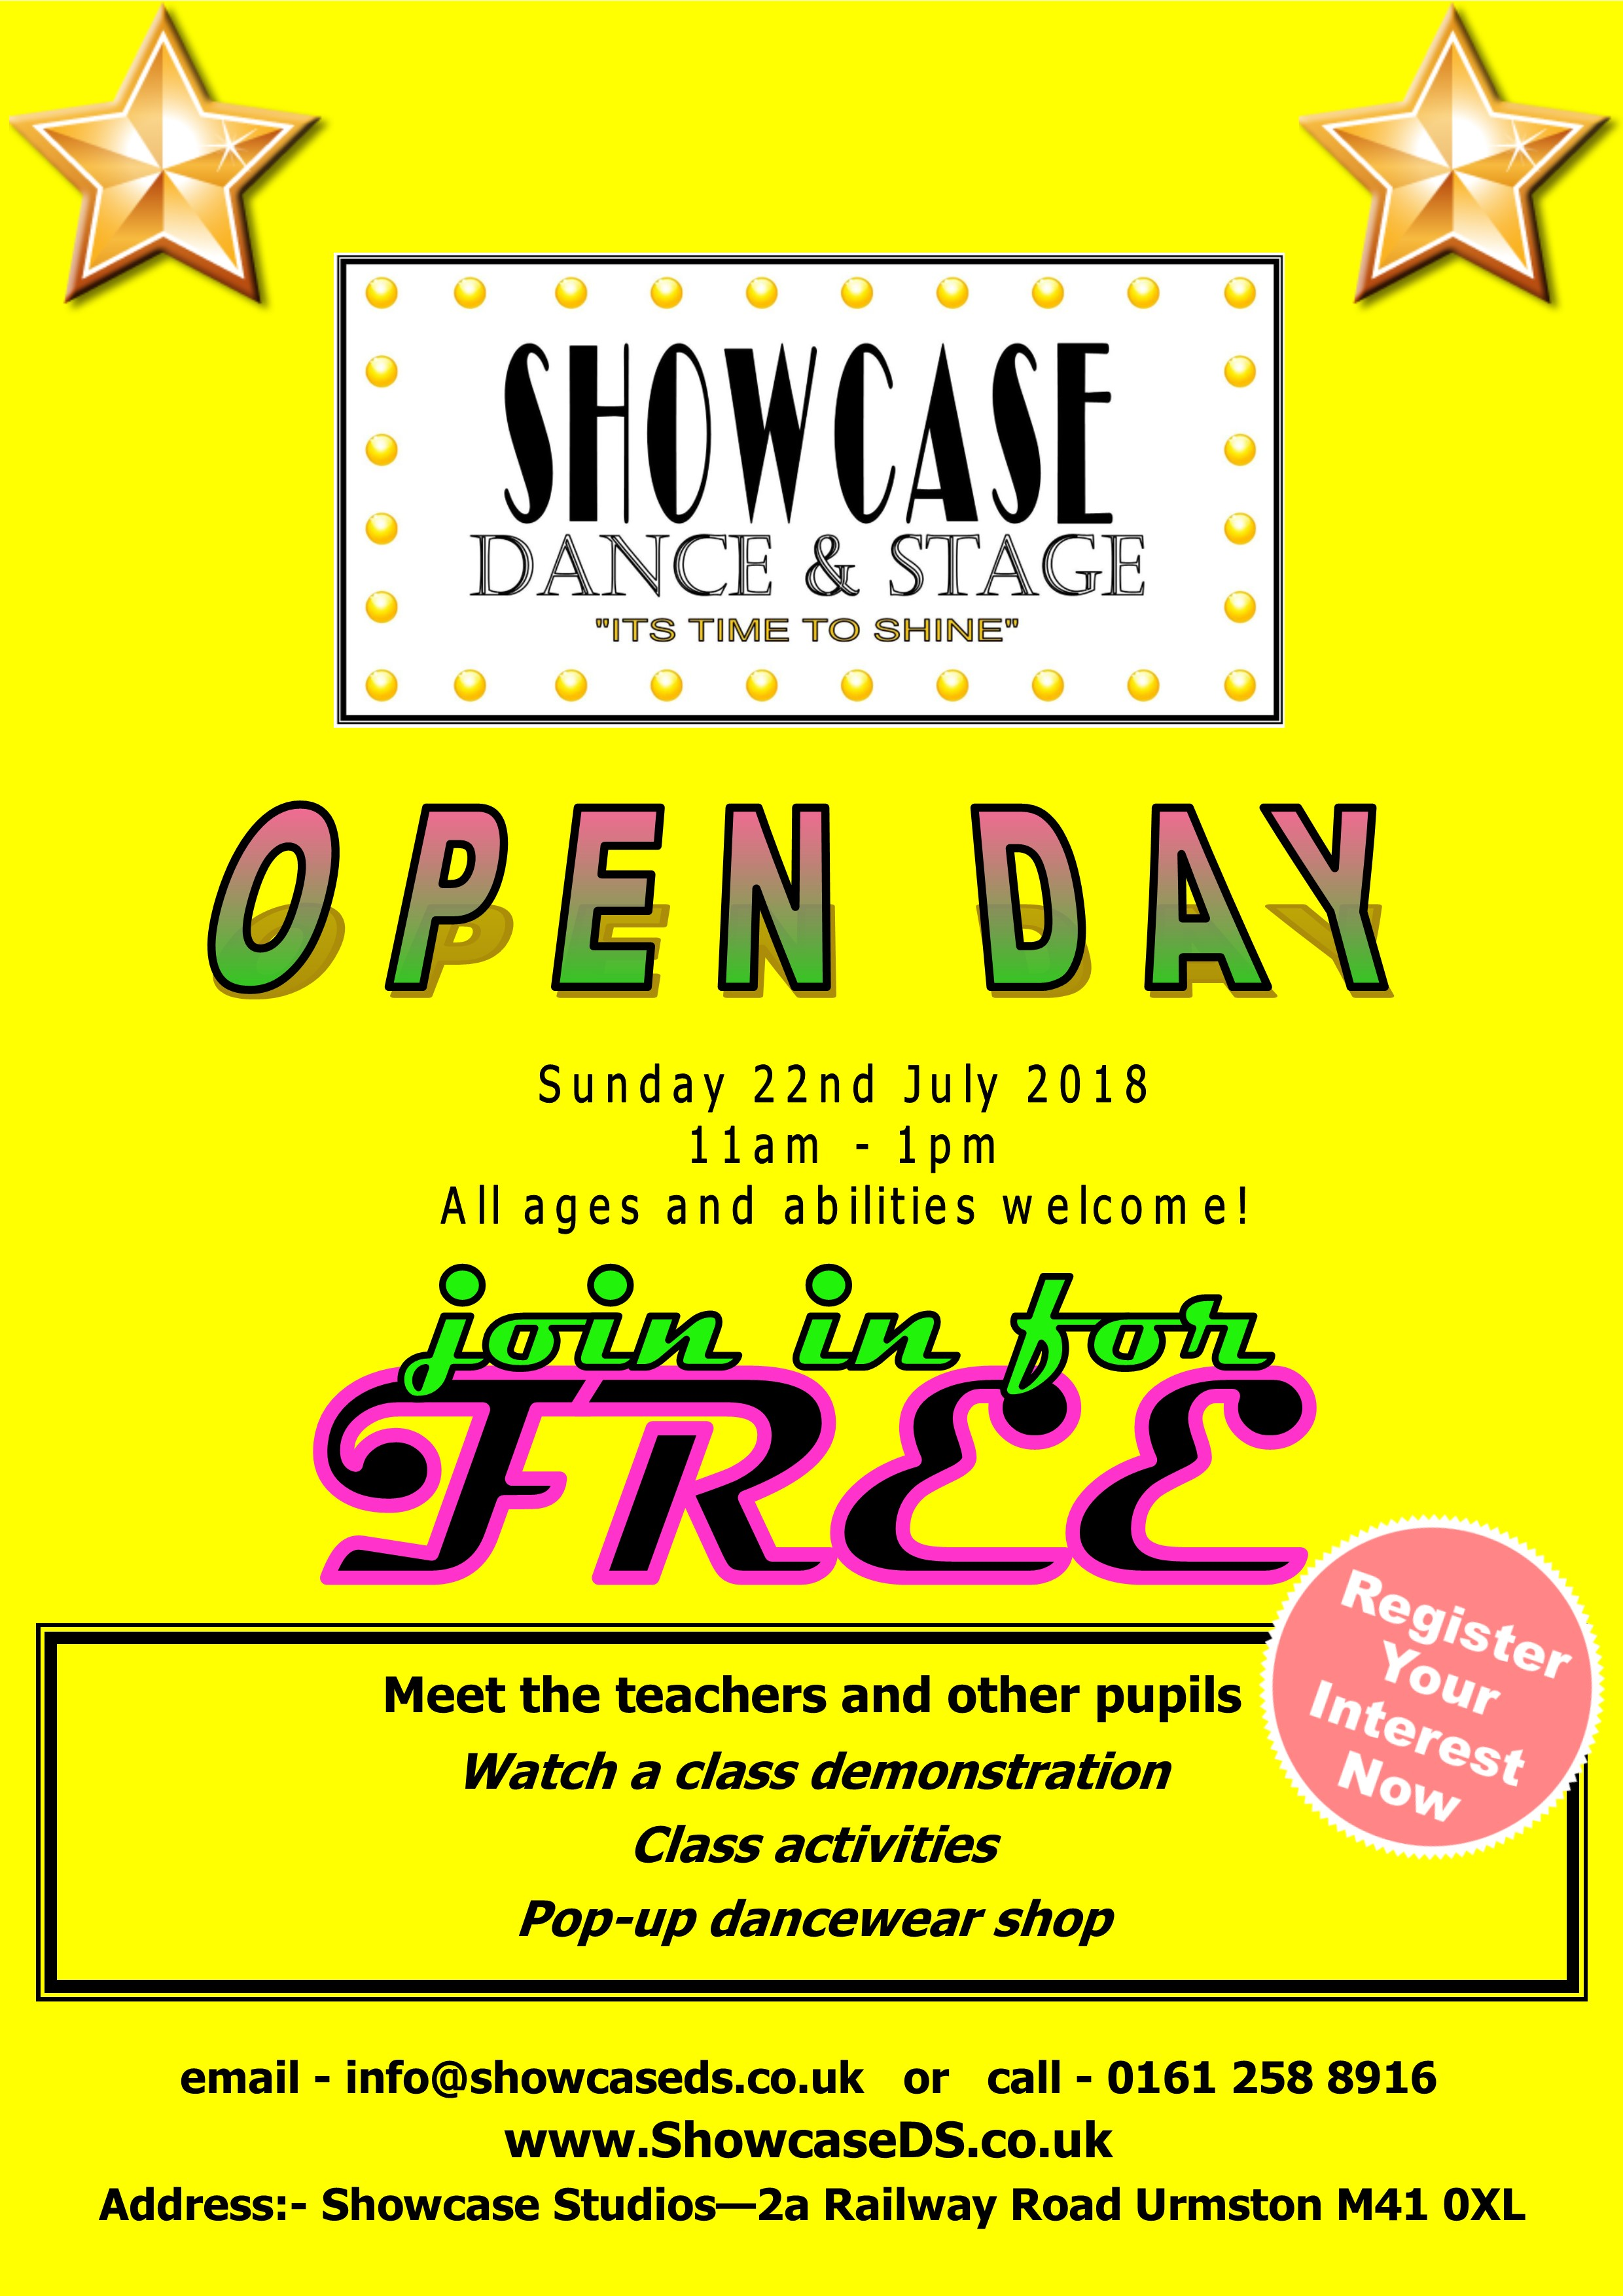 ShowcaseDS MCR Open Day 250519